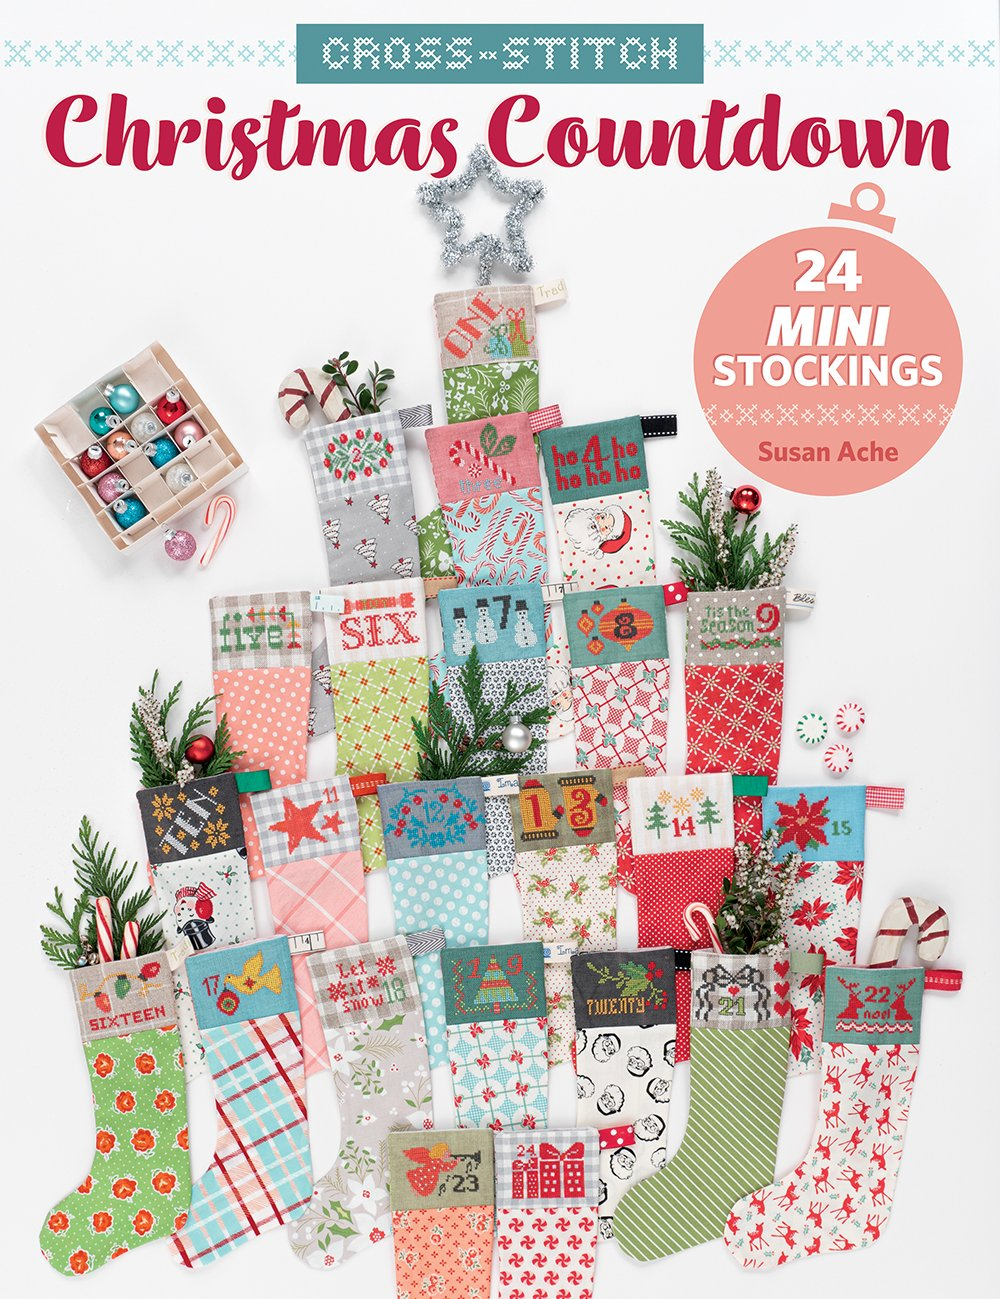 Cross-Stitch Christmas Countdown Book by Susan Ache